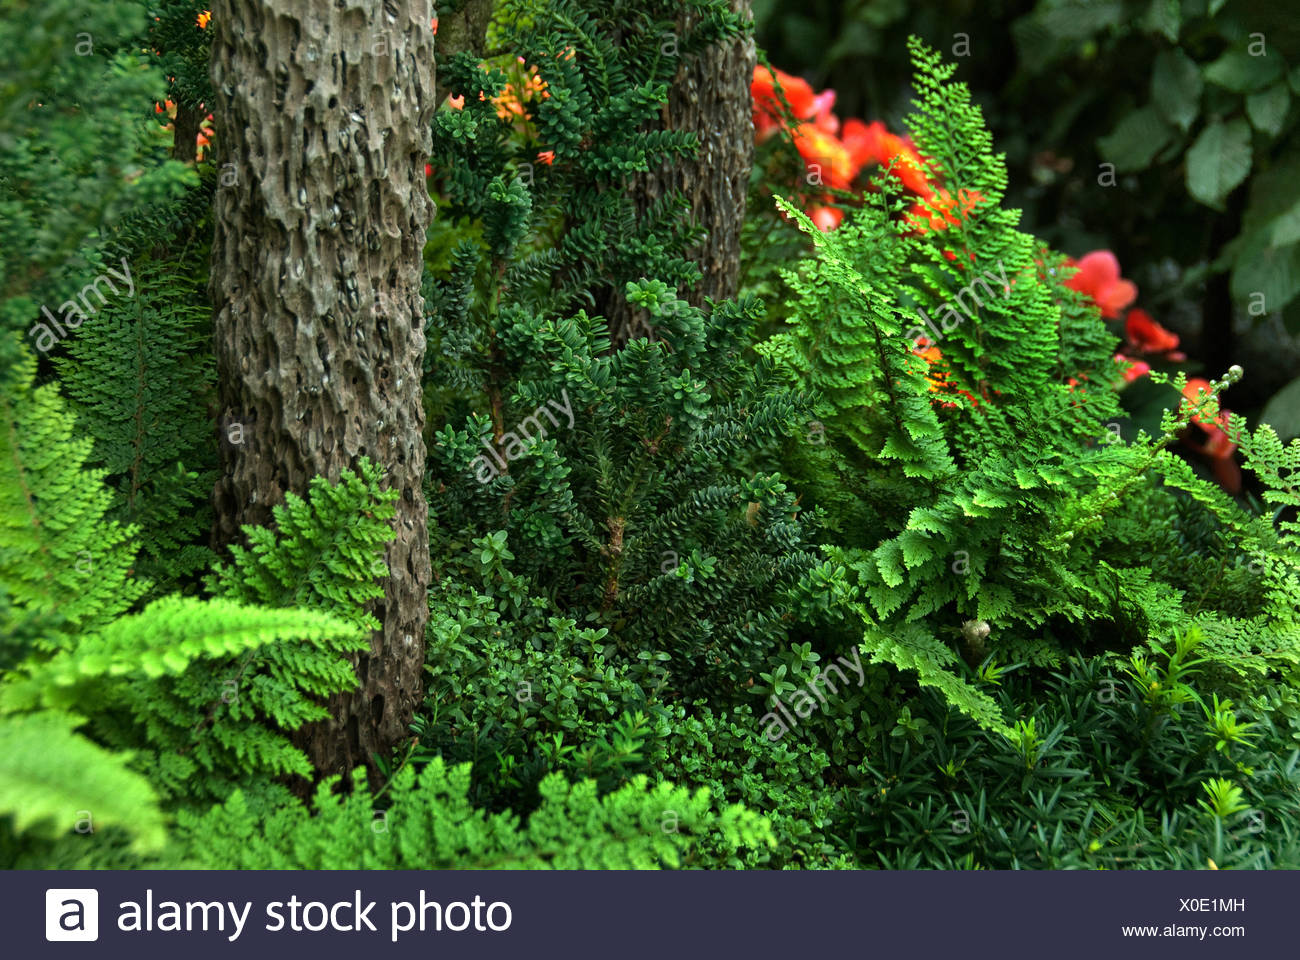 common yew (Taxus baccata 'Amersfoort', Taxus baccata Amersfoort), cultivar Amersfort - Stock Image